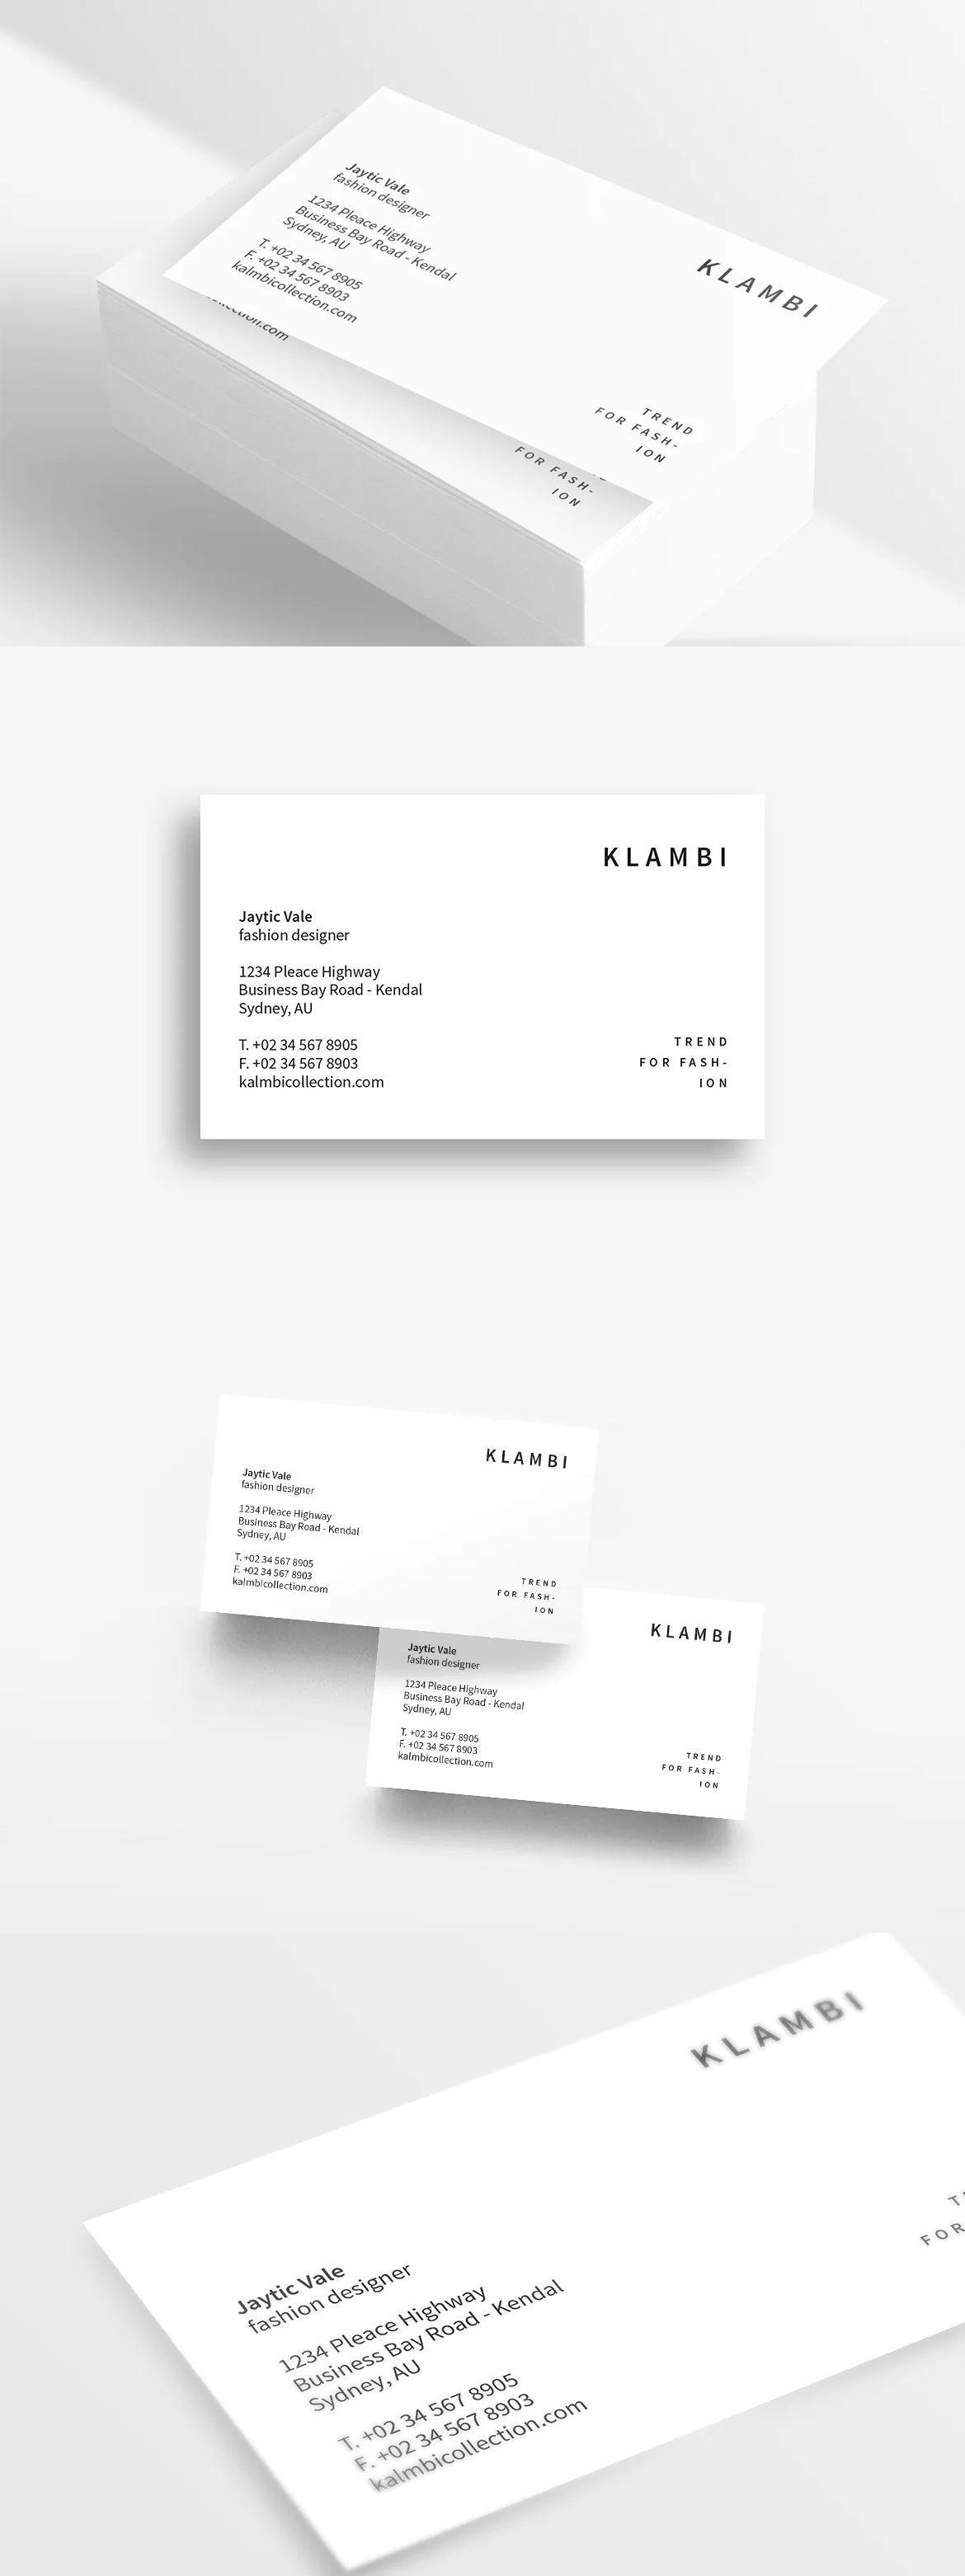 001 Unique Vistaprint Busines Card Template Indesign Idea Full